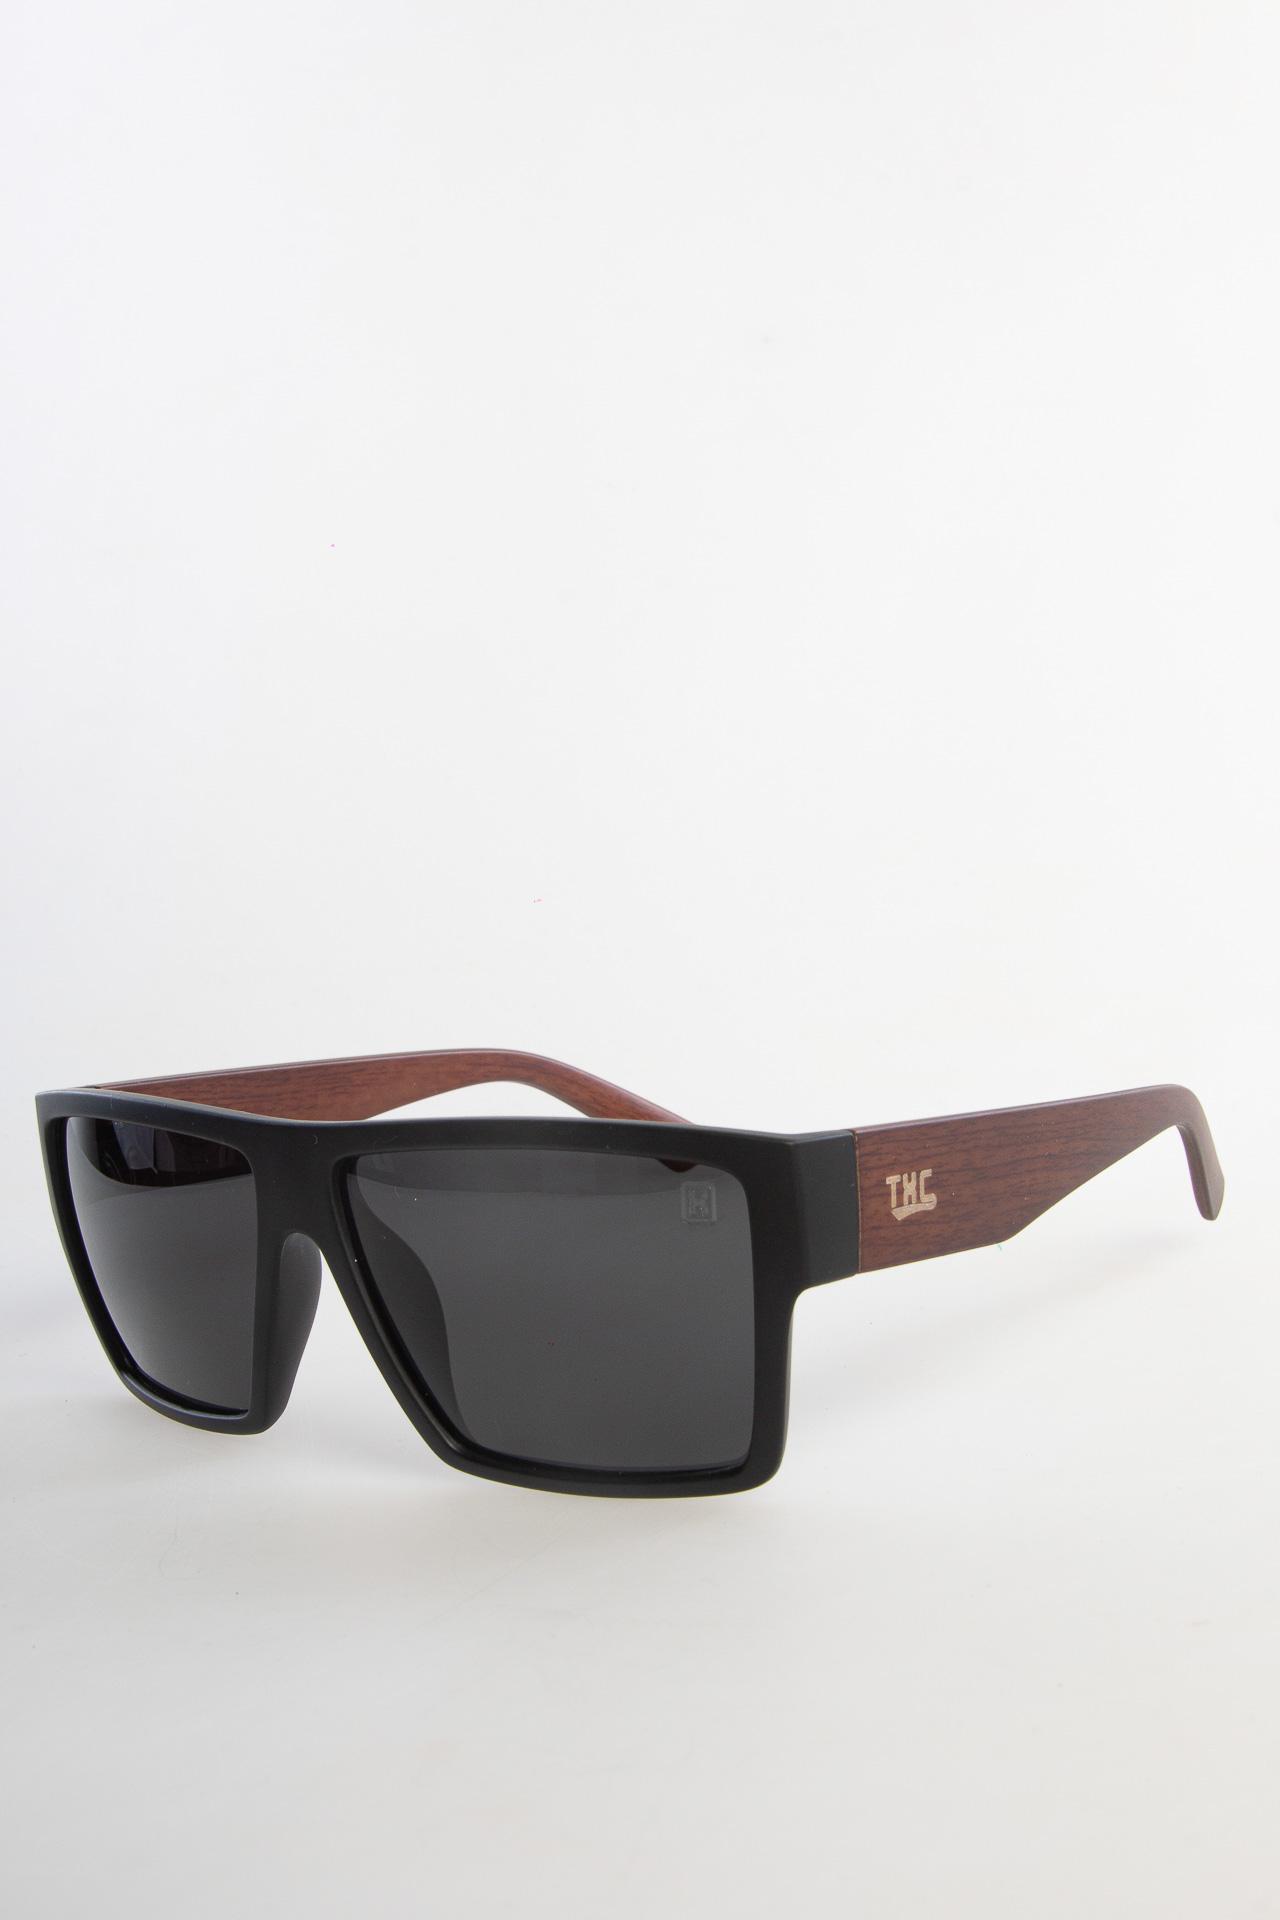 Óculos de Sol TXC 68.1 OC